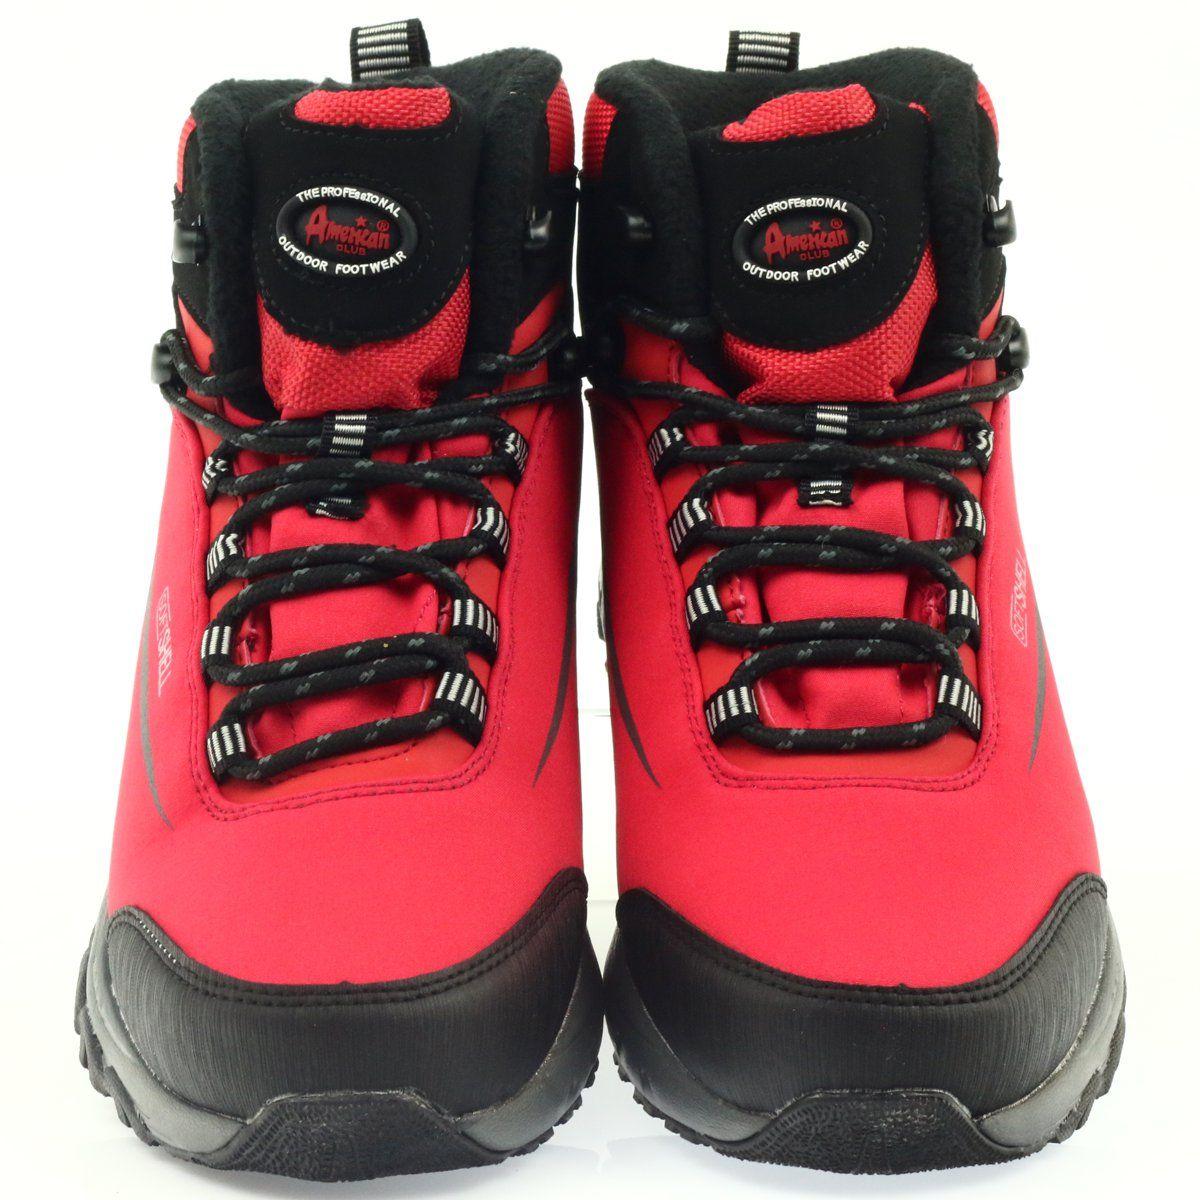 American Club Trekkingi Softshell Z Membrana Czarne Czerwone Hiking Boots Softshell Boots